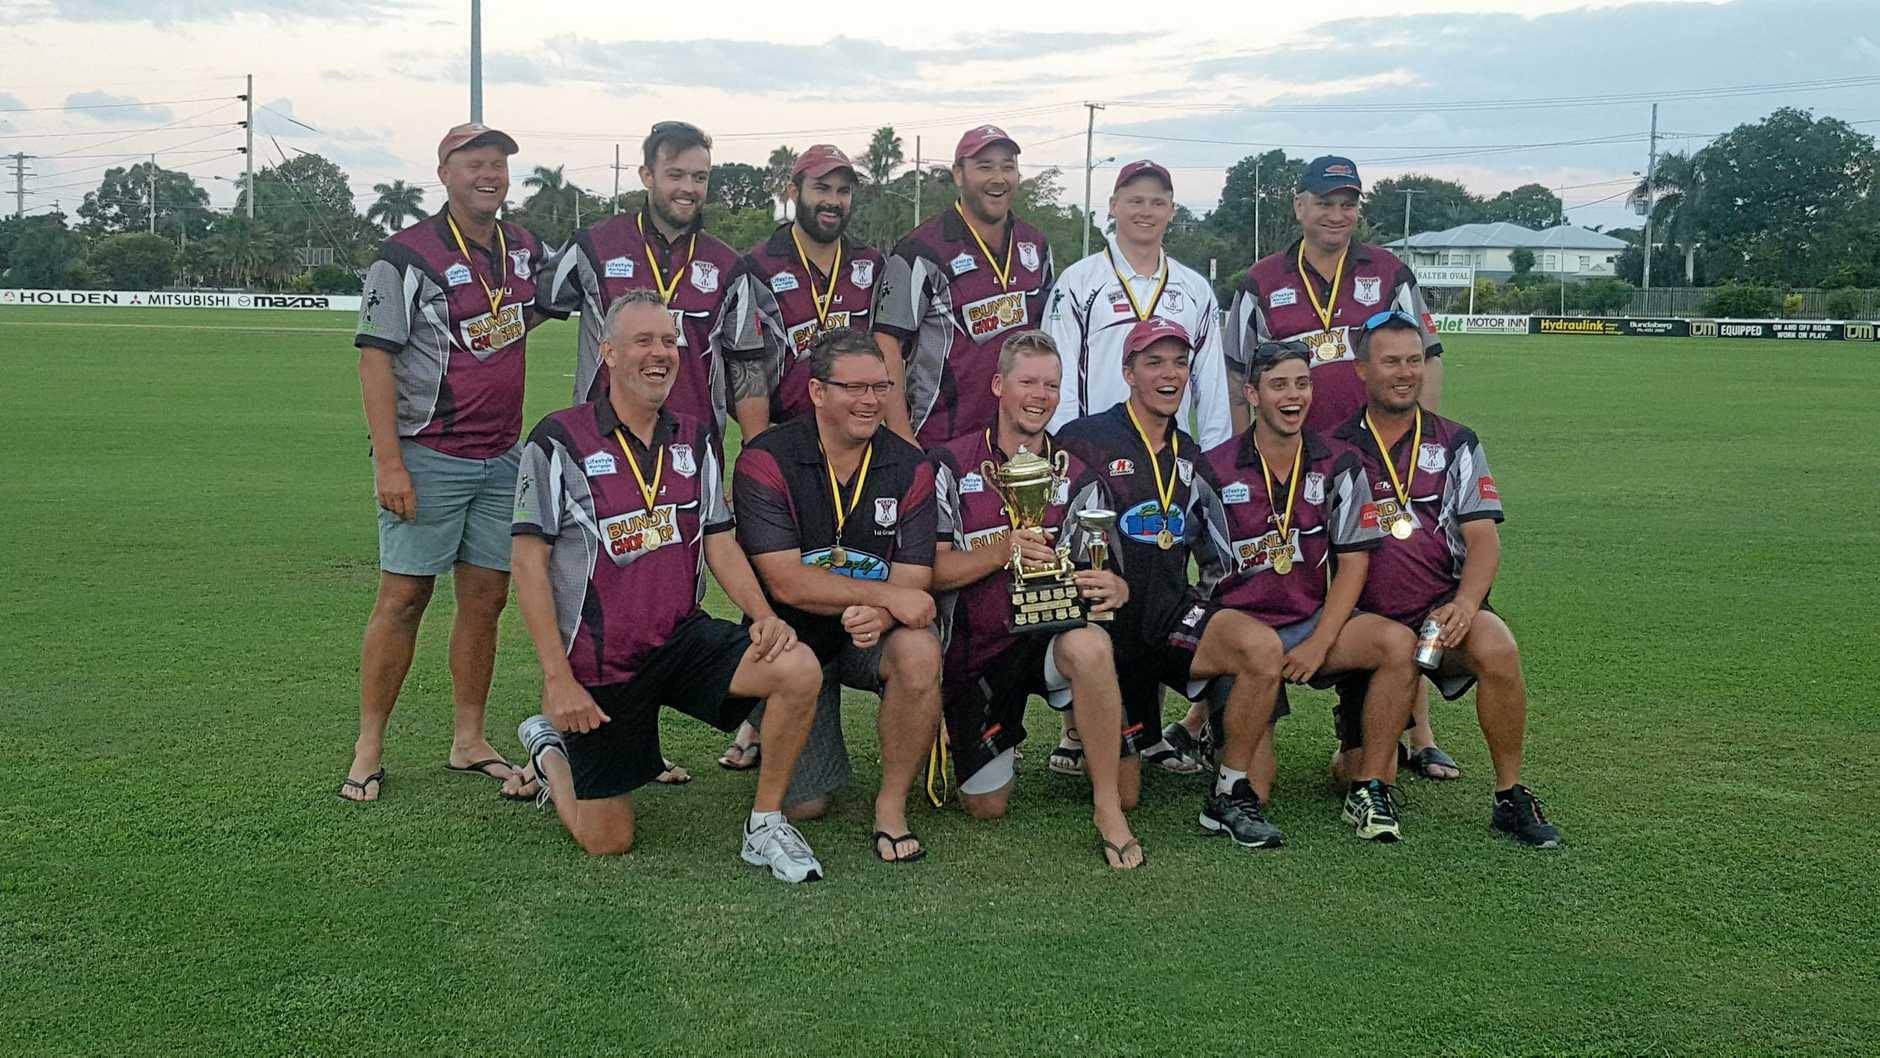 CELEBRATE: Norths celebrate winning the division 1 Bundaberg cricket title last season against The Waves.